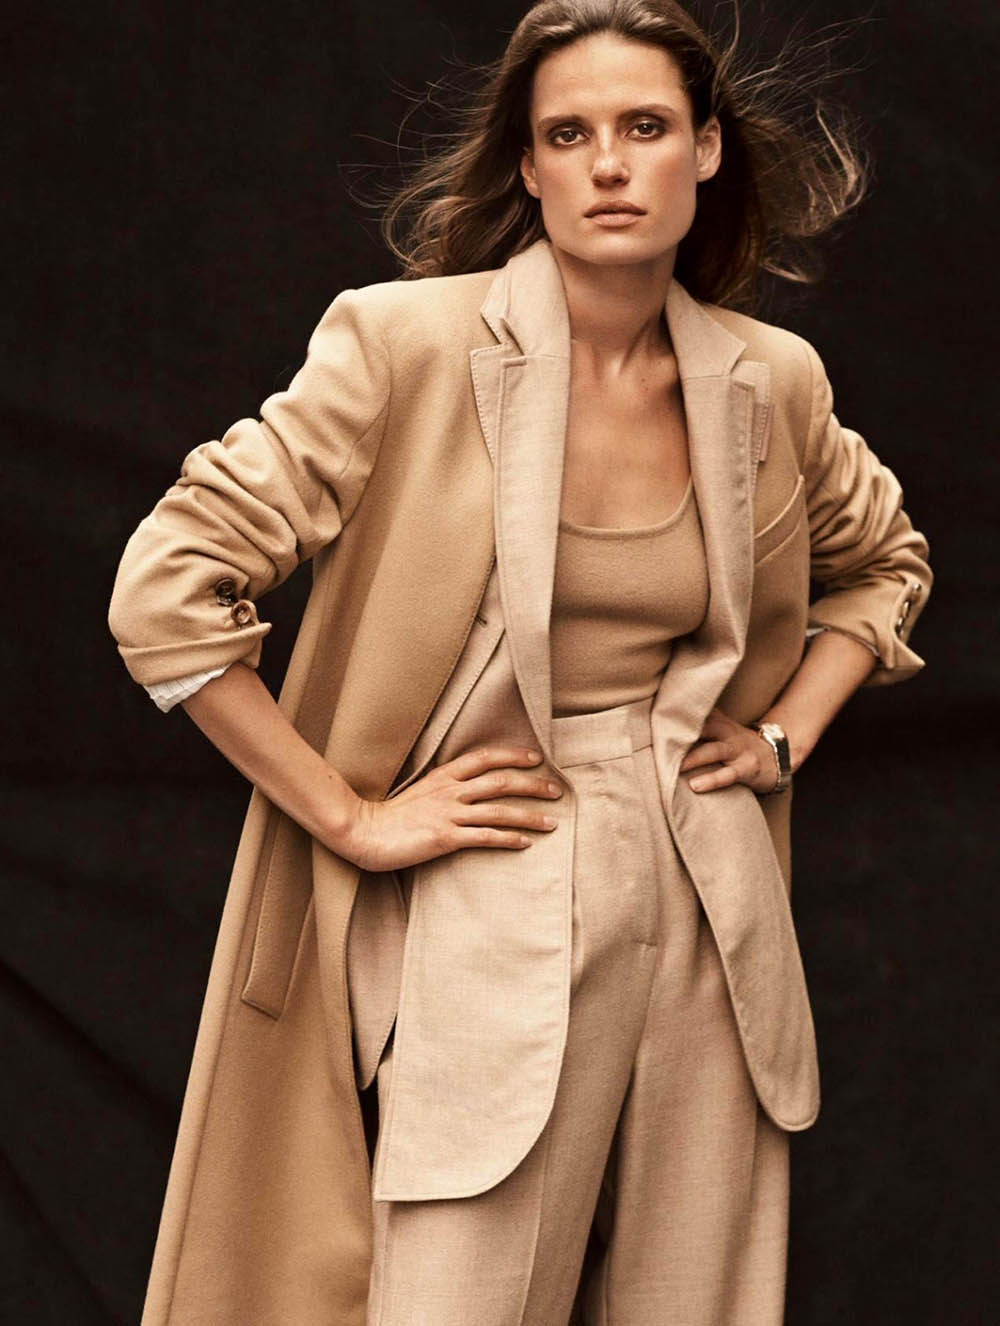 Cate Underwood by Tom Schirmacher for Elle UK October 2019